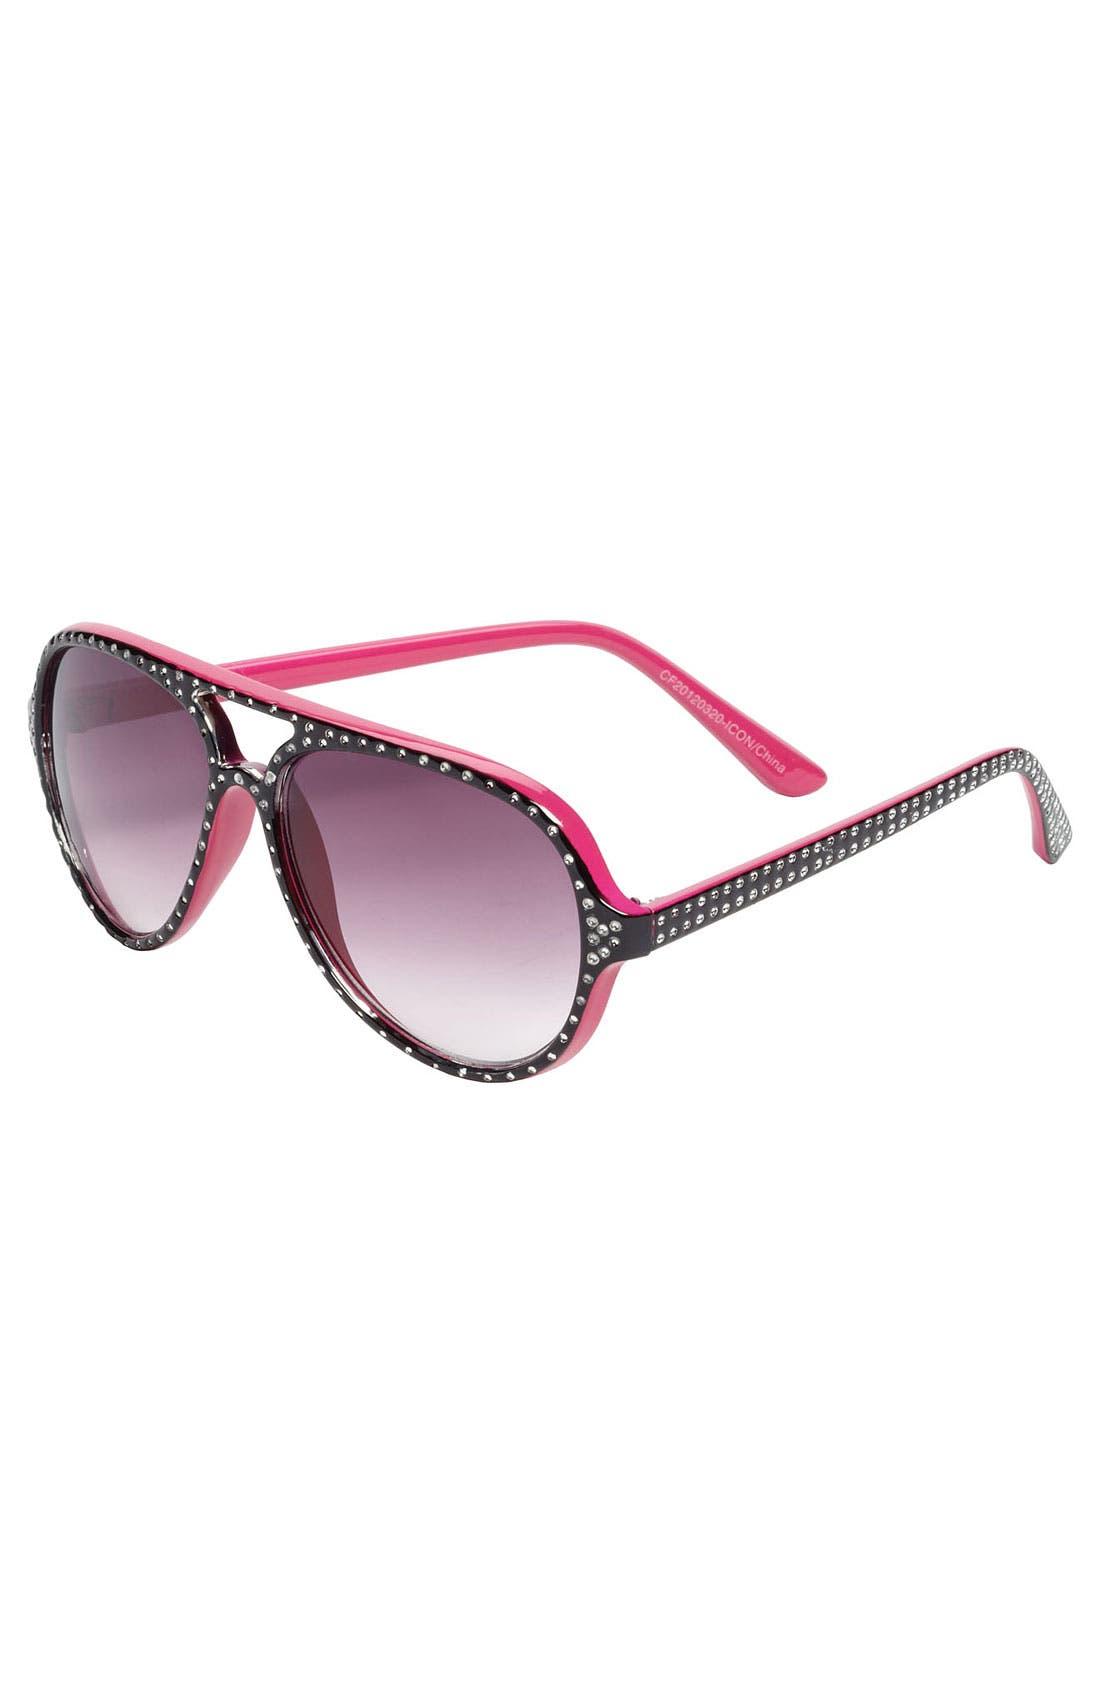 Alternate Image 1 Selected - Icon Eyewear Aviator Sunglasses (Girls)